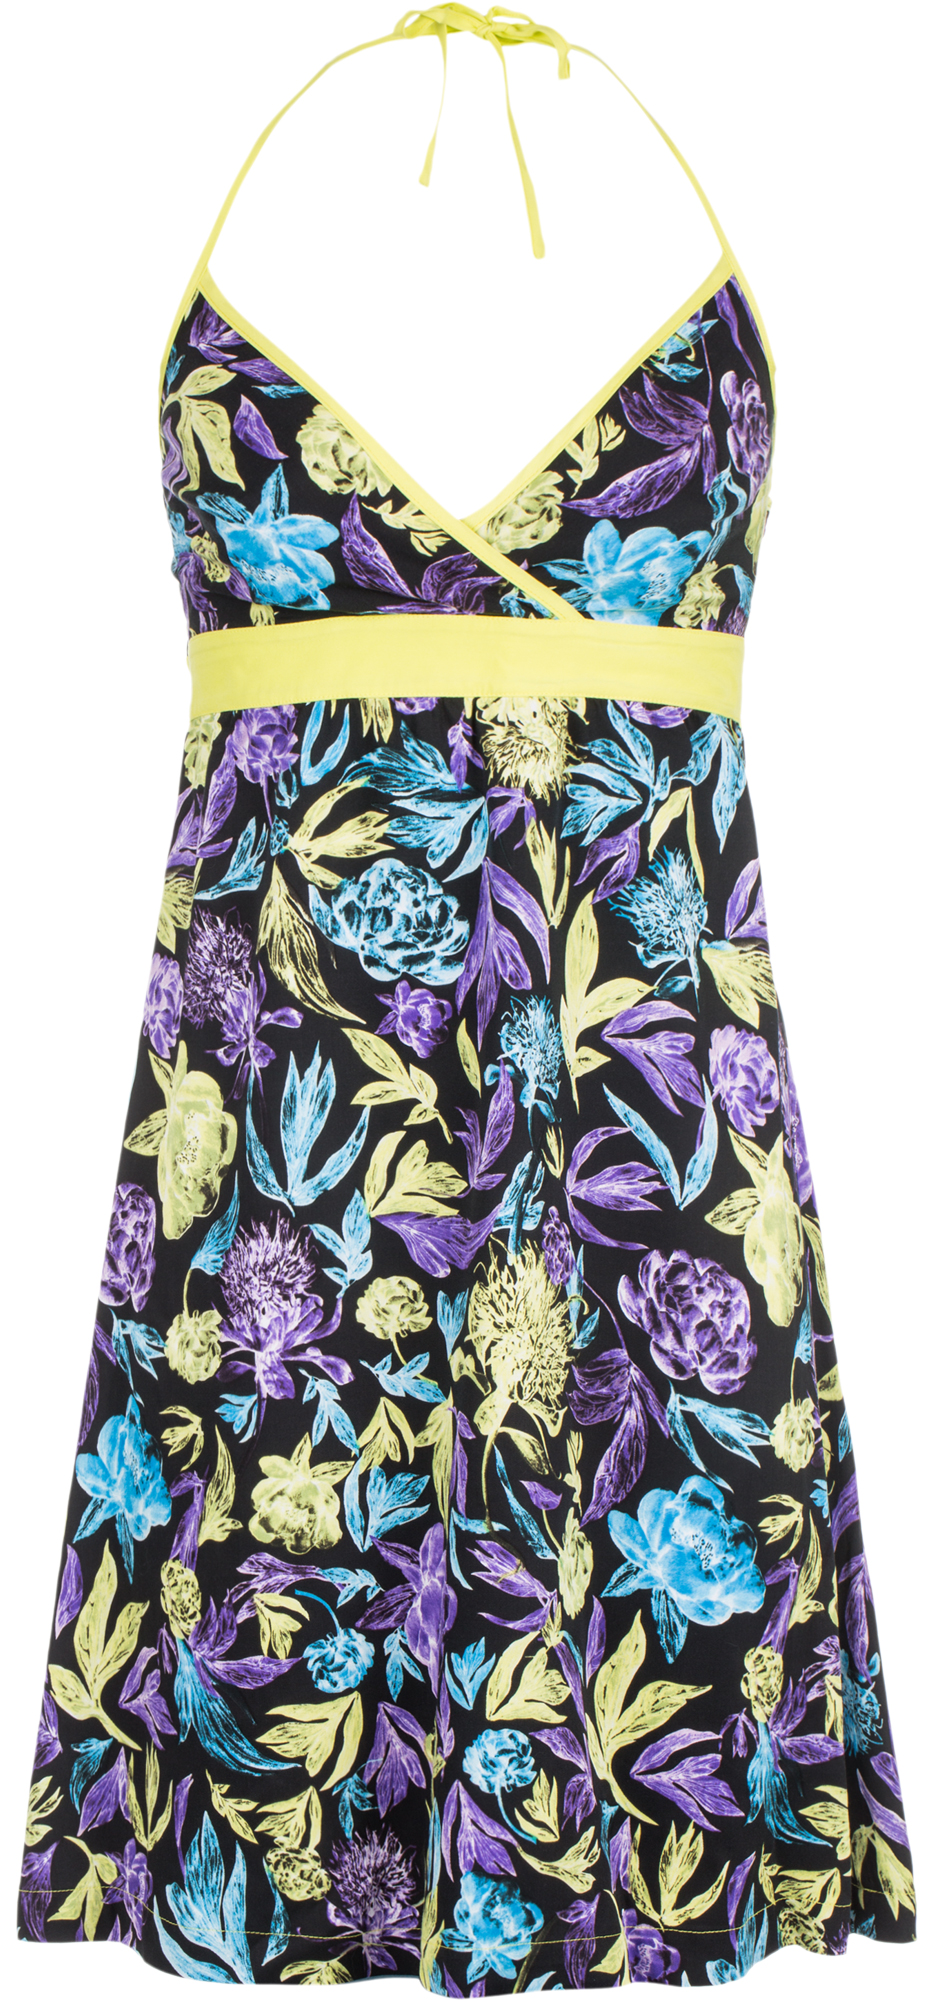 Termit Платье женское Termit, размер 52